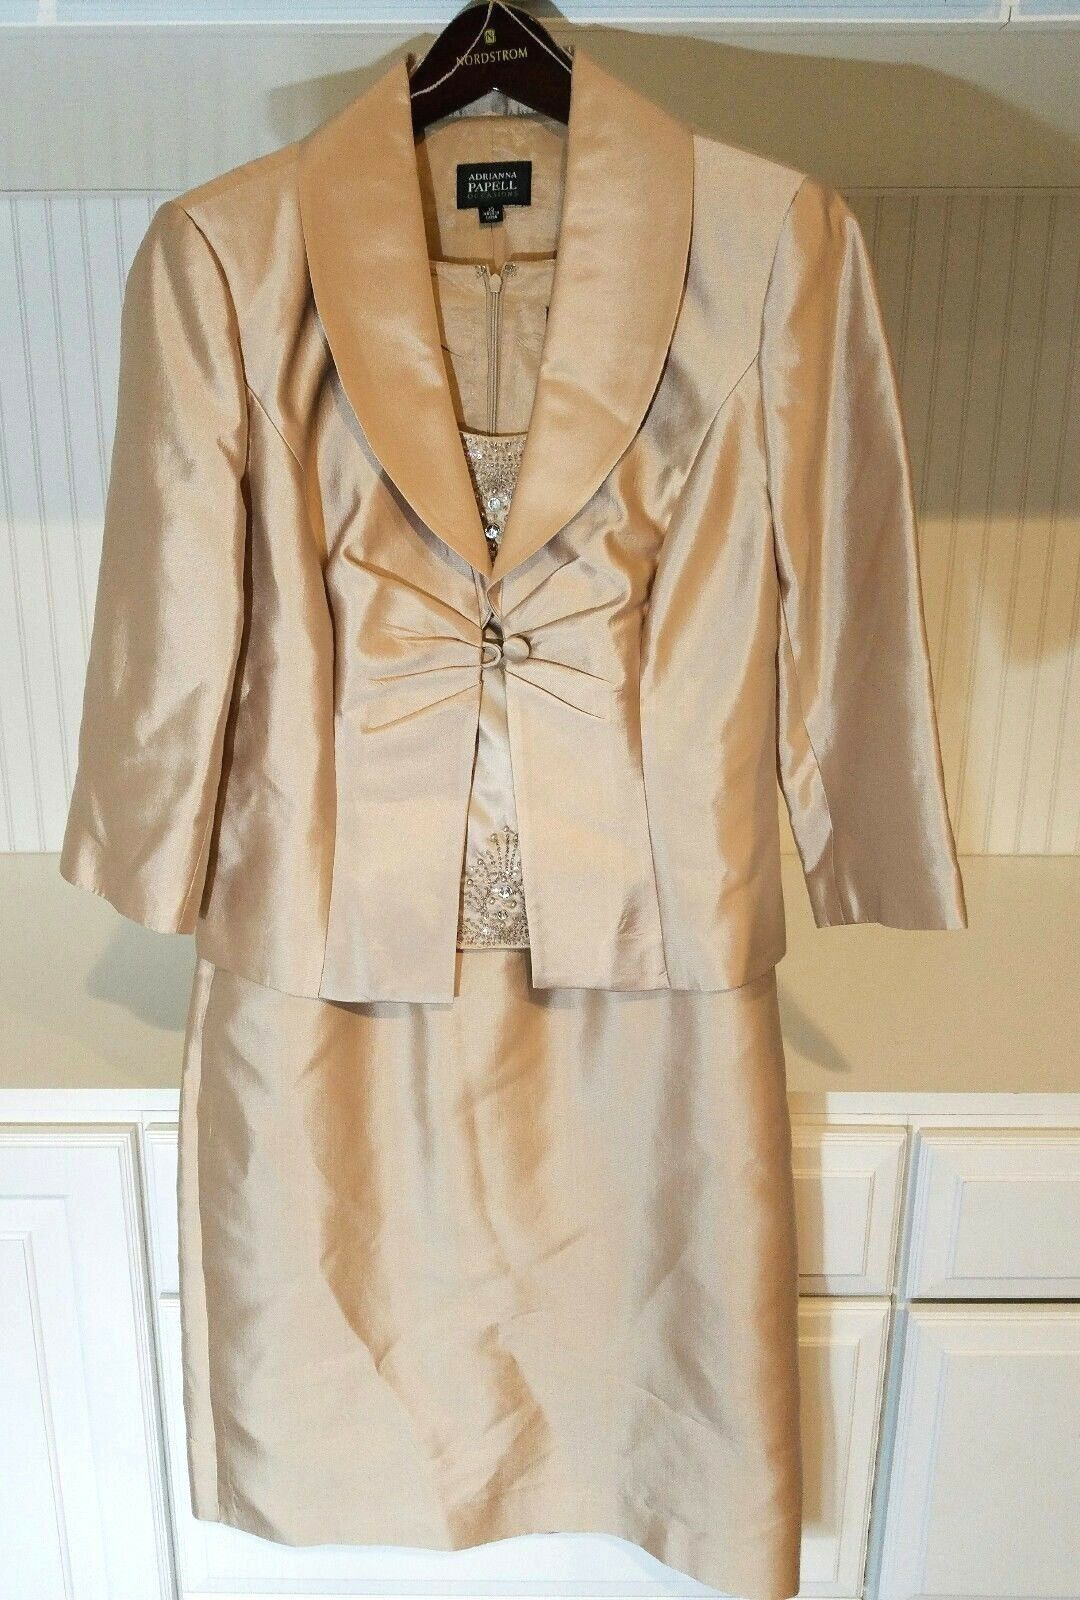 Adrianna Papell Size 10 2 Piece Set Dress Suit Jacket Silk Mother Bride Gala